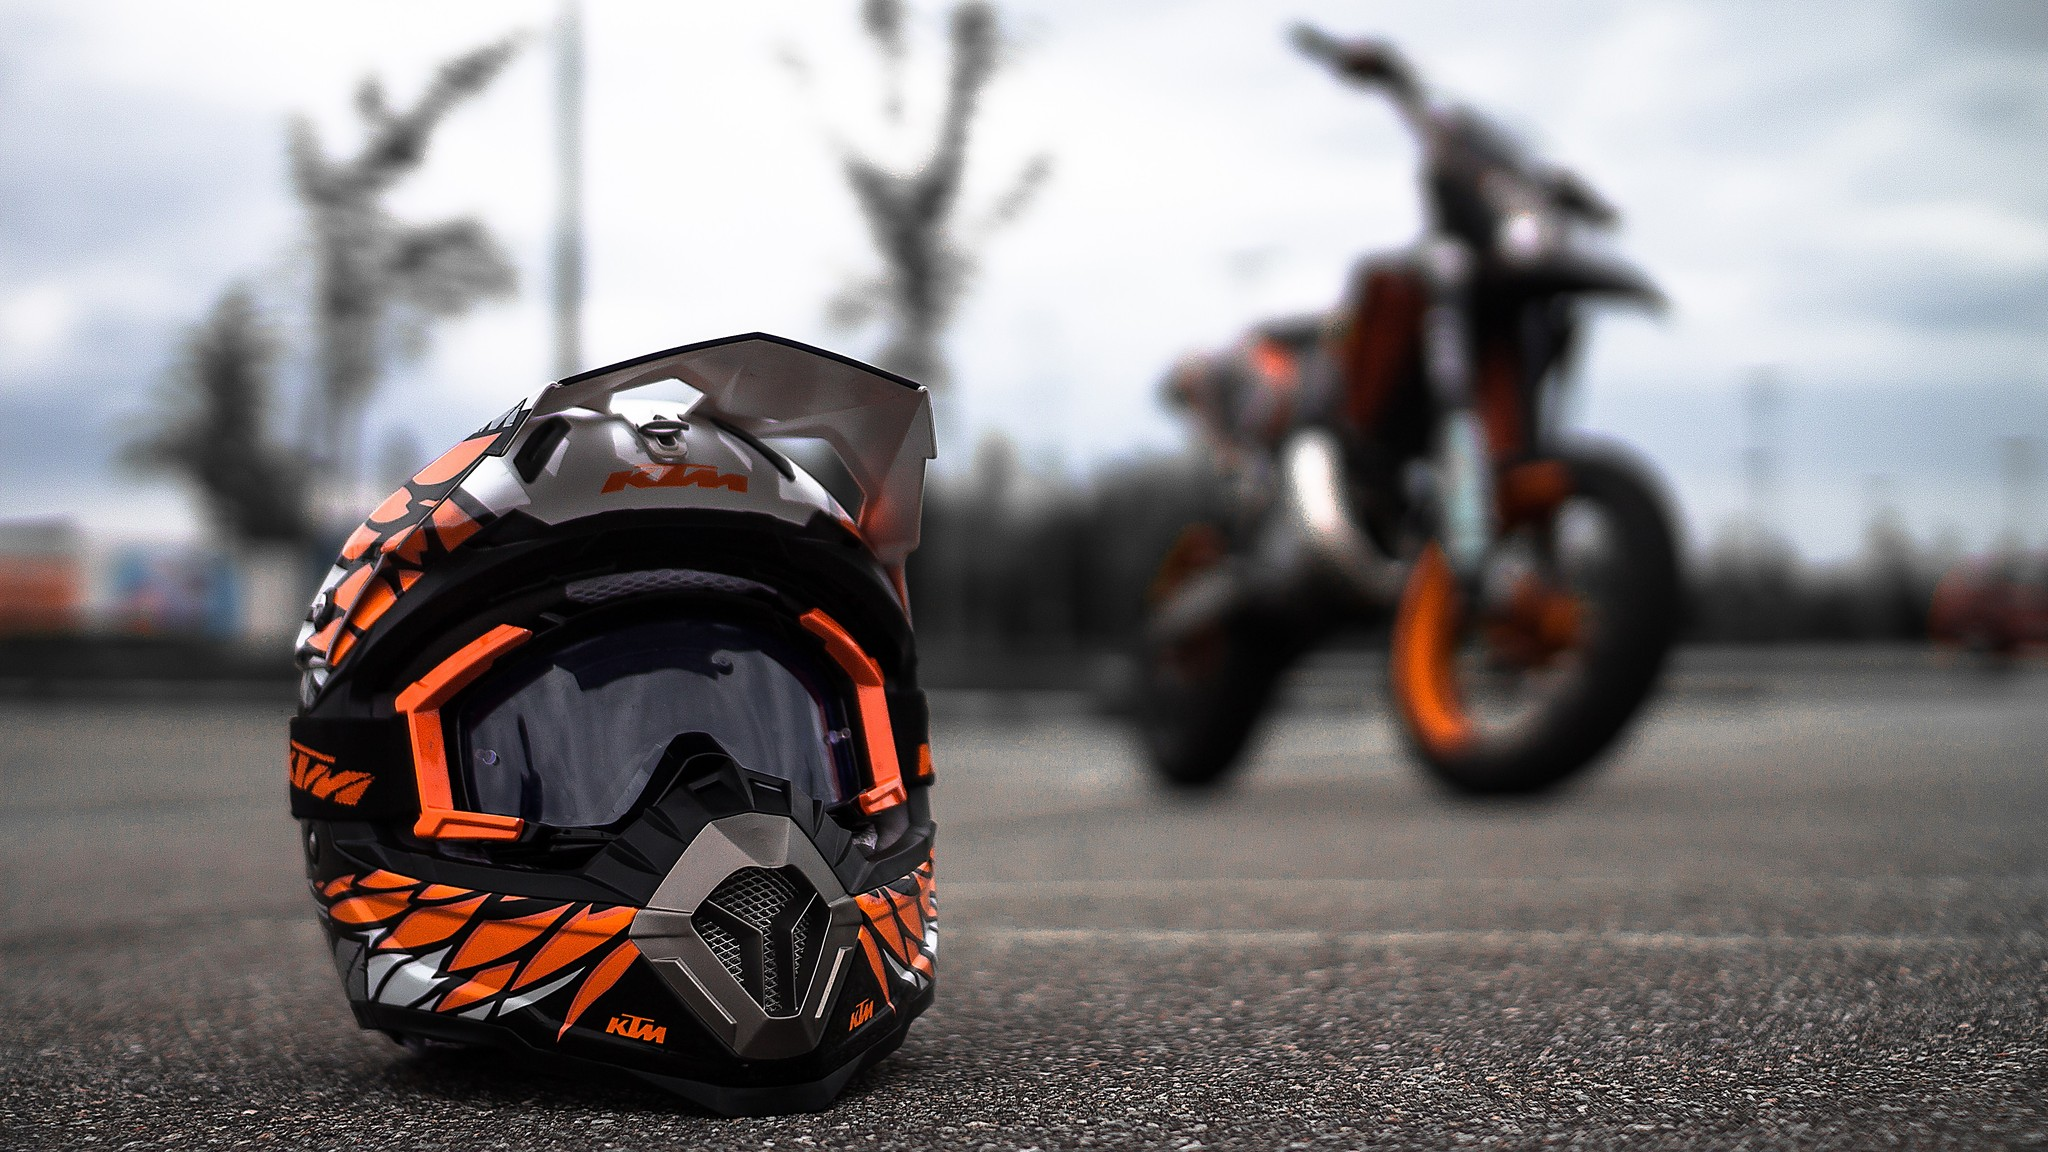 KTM Helmet Desktop Wallpaper 60564 2048x1152 px 2048x1152